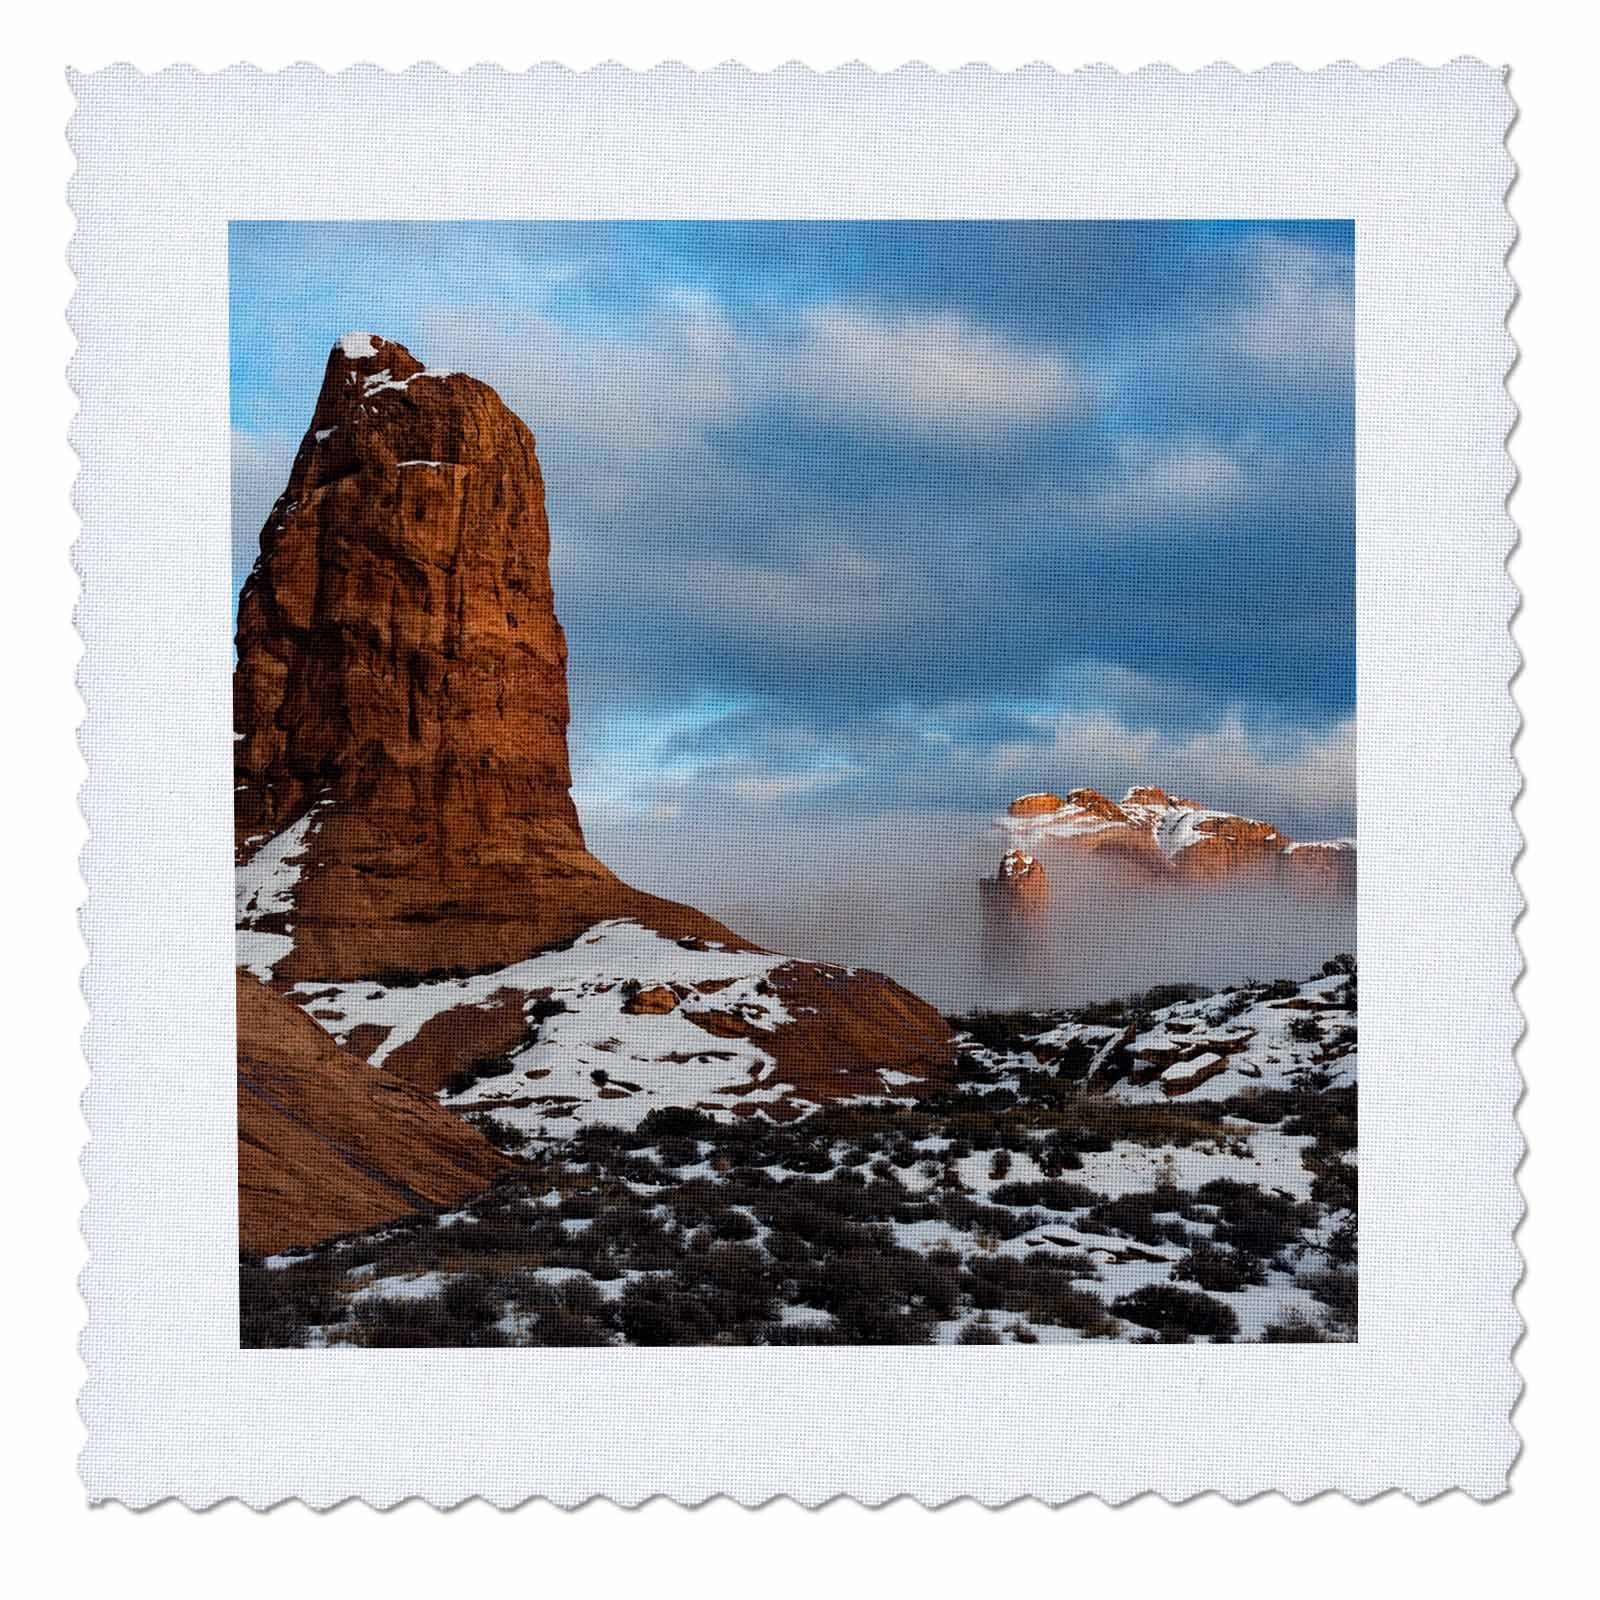 3dRose Danita Delimont - Utah - USA, Utah. Fog descending over eroded cliffs of the Windows Section - 16x16 inch quilt square (qs_260317_6)